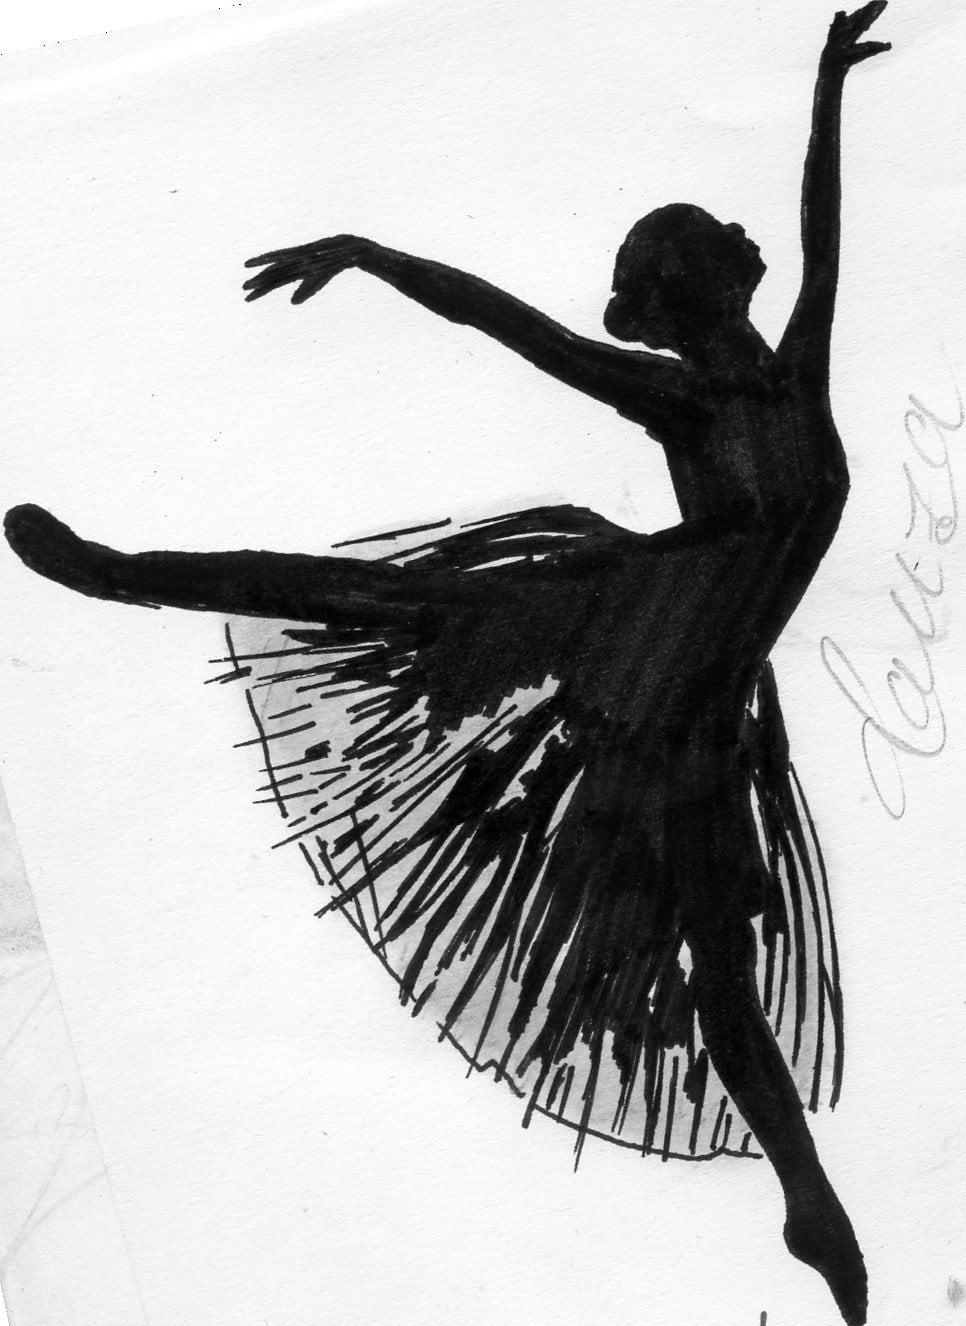 Cuerpo de baile - 2 part 8